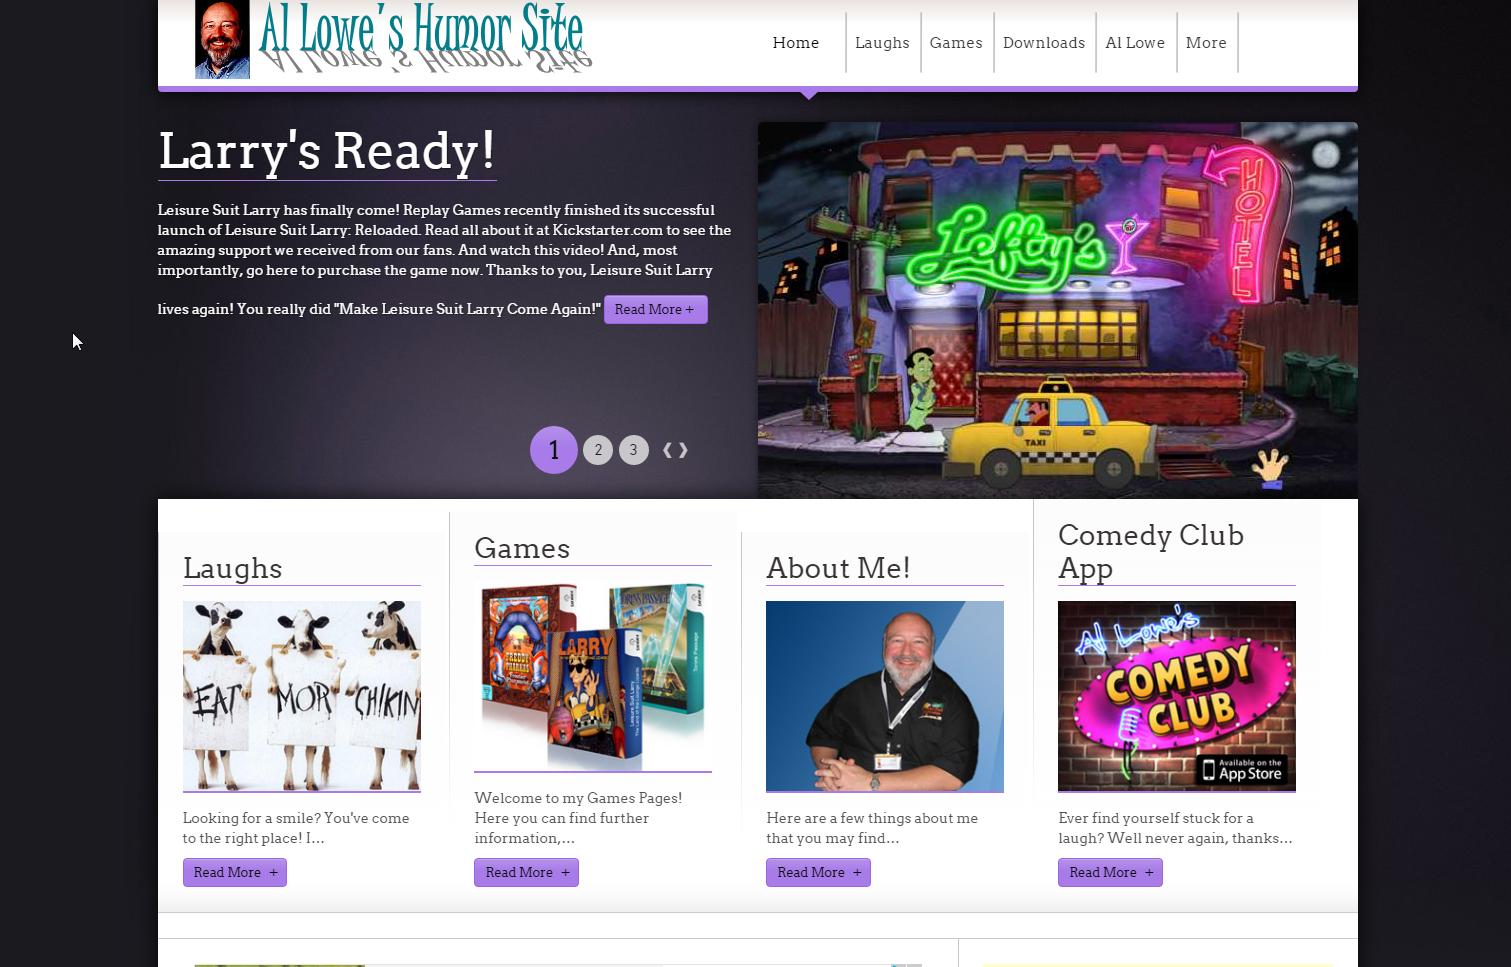 Screenshot of website Al Lowe's Humor Site